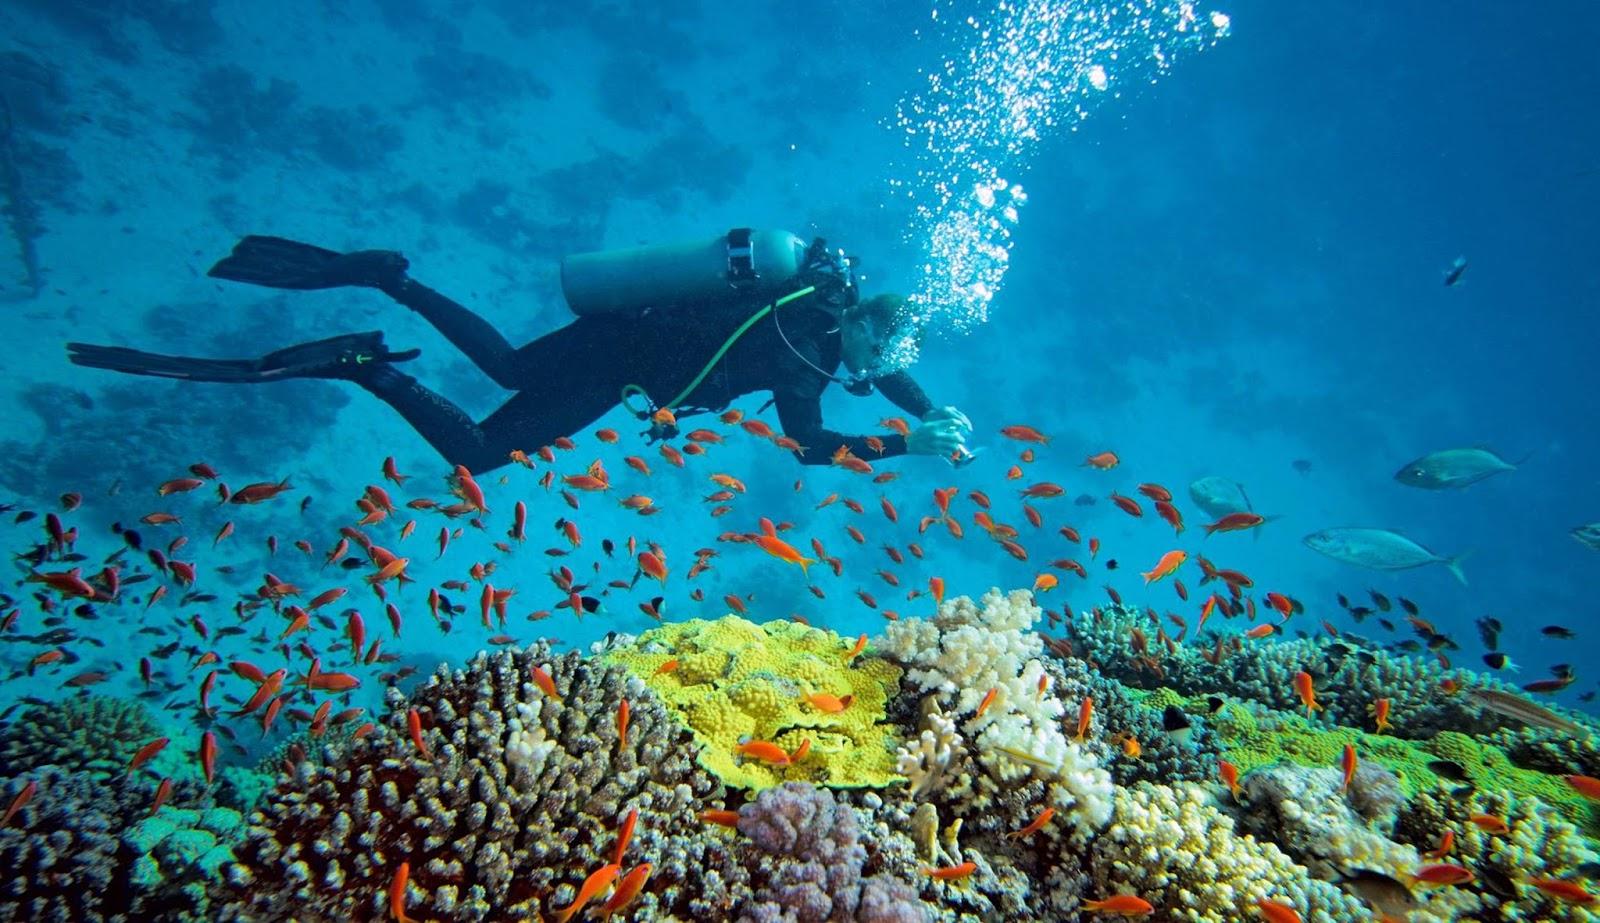 Bagaimana Cara Panduan Lengkap Wisata Ke Kepulauan Derawan